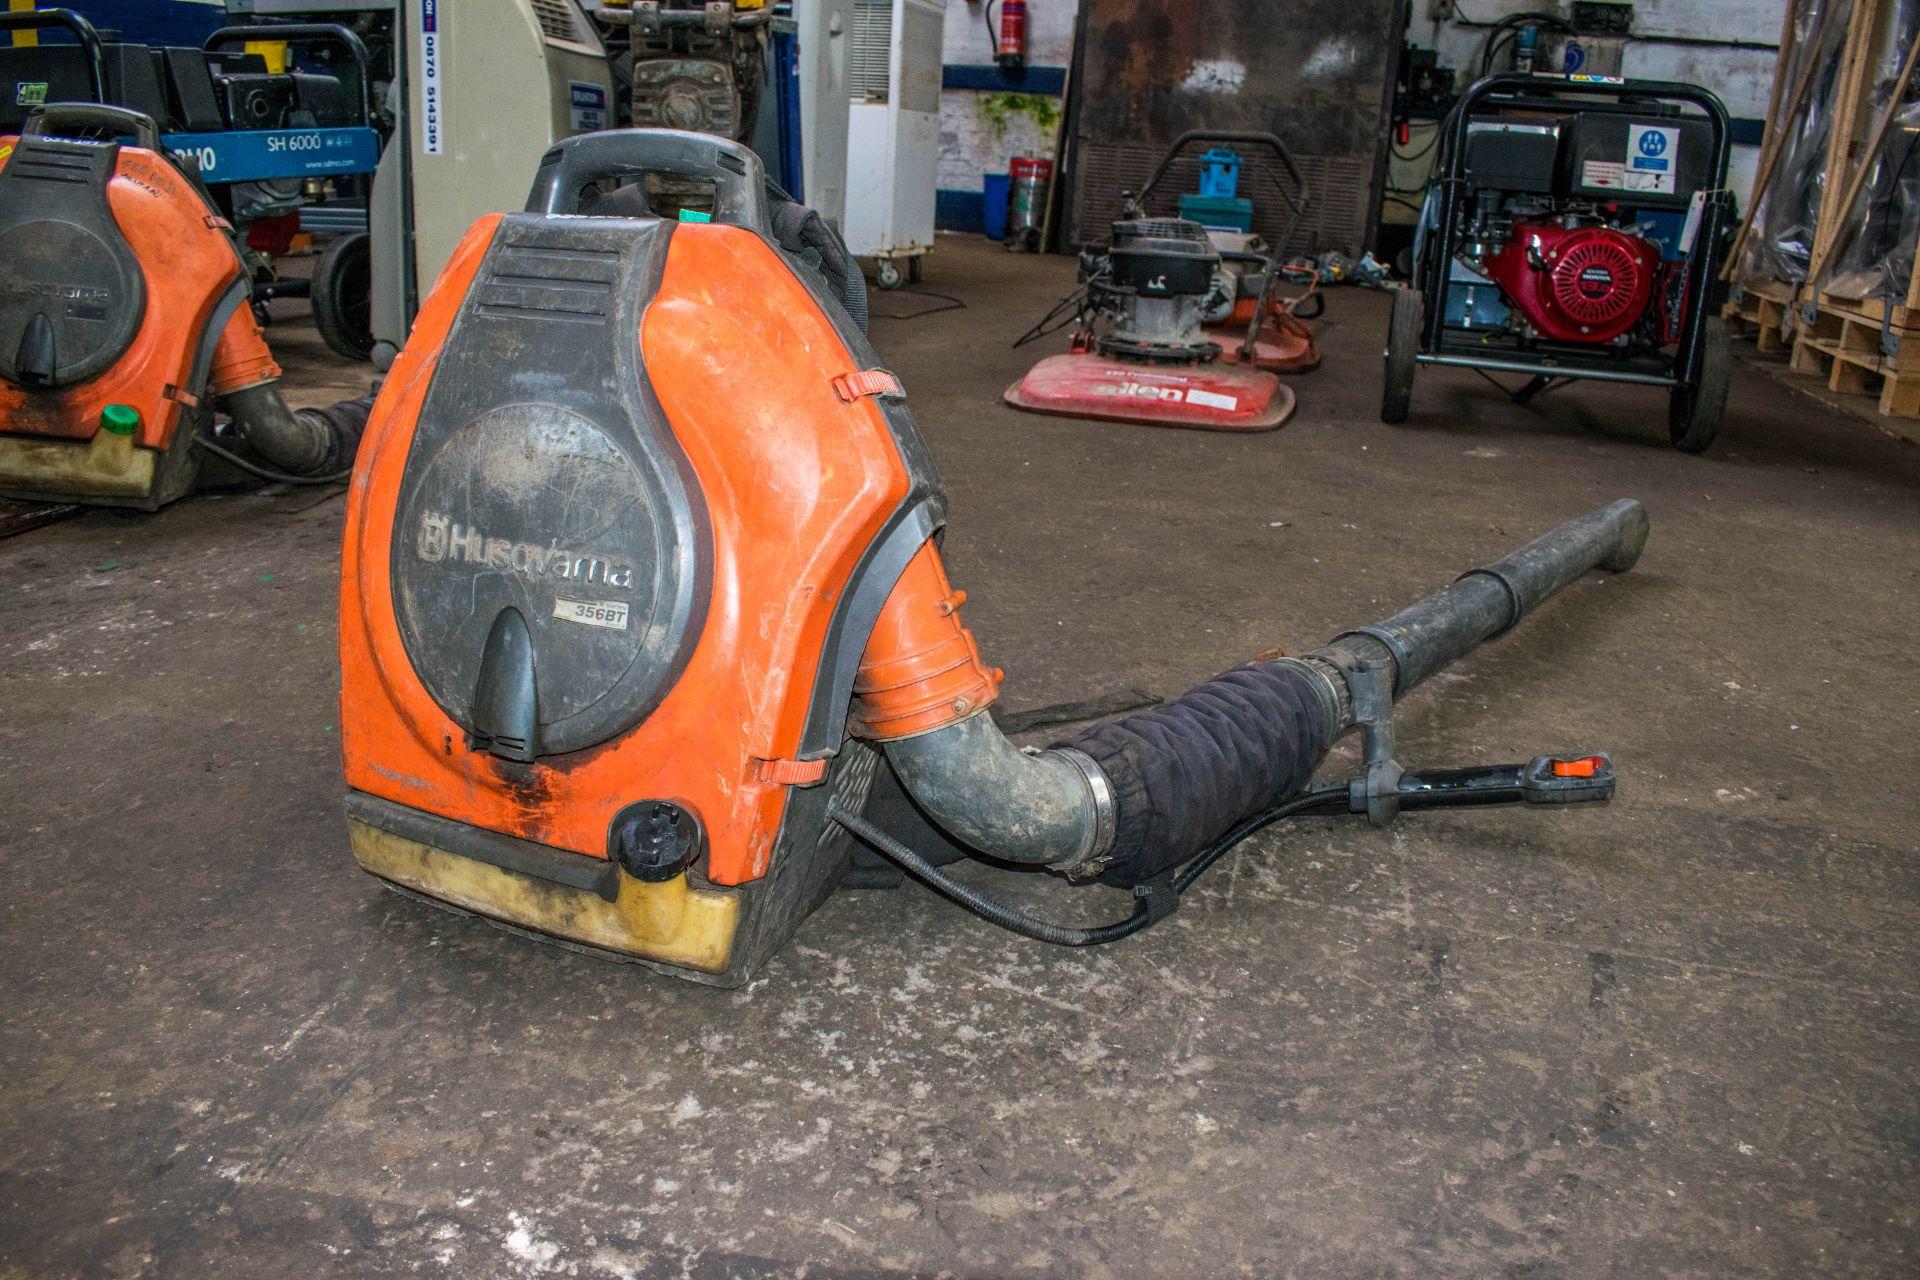 Lot 558 - Husqvarna petrol driven back pack leaf blower